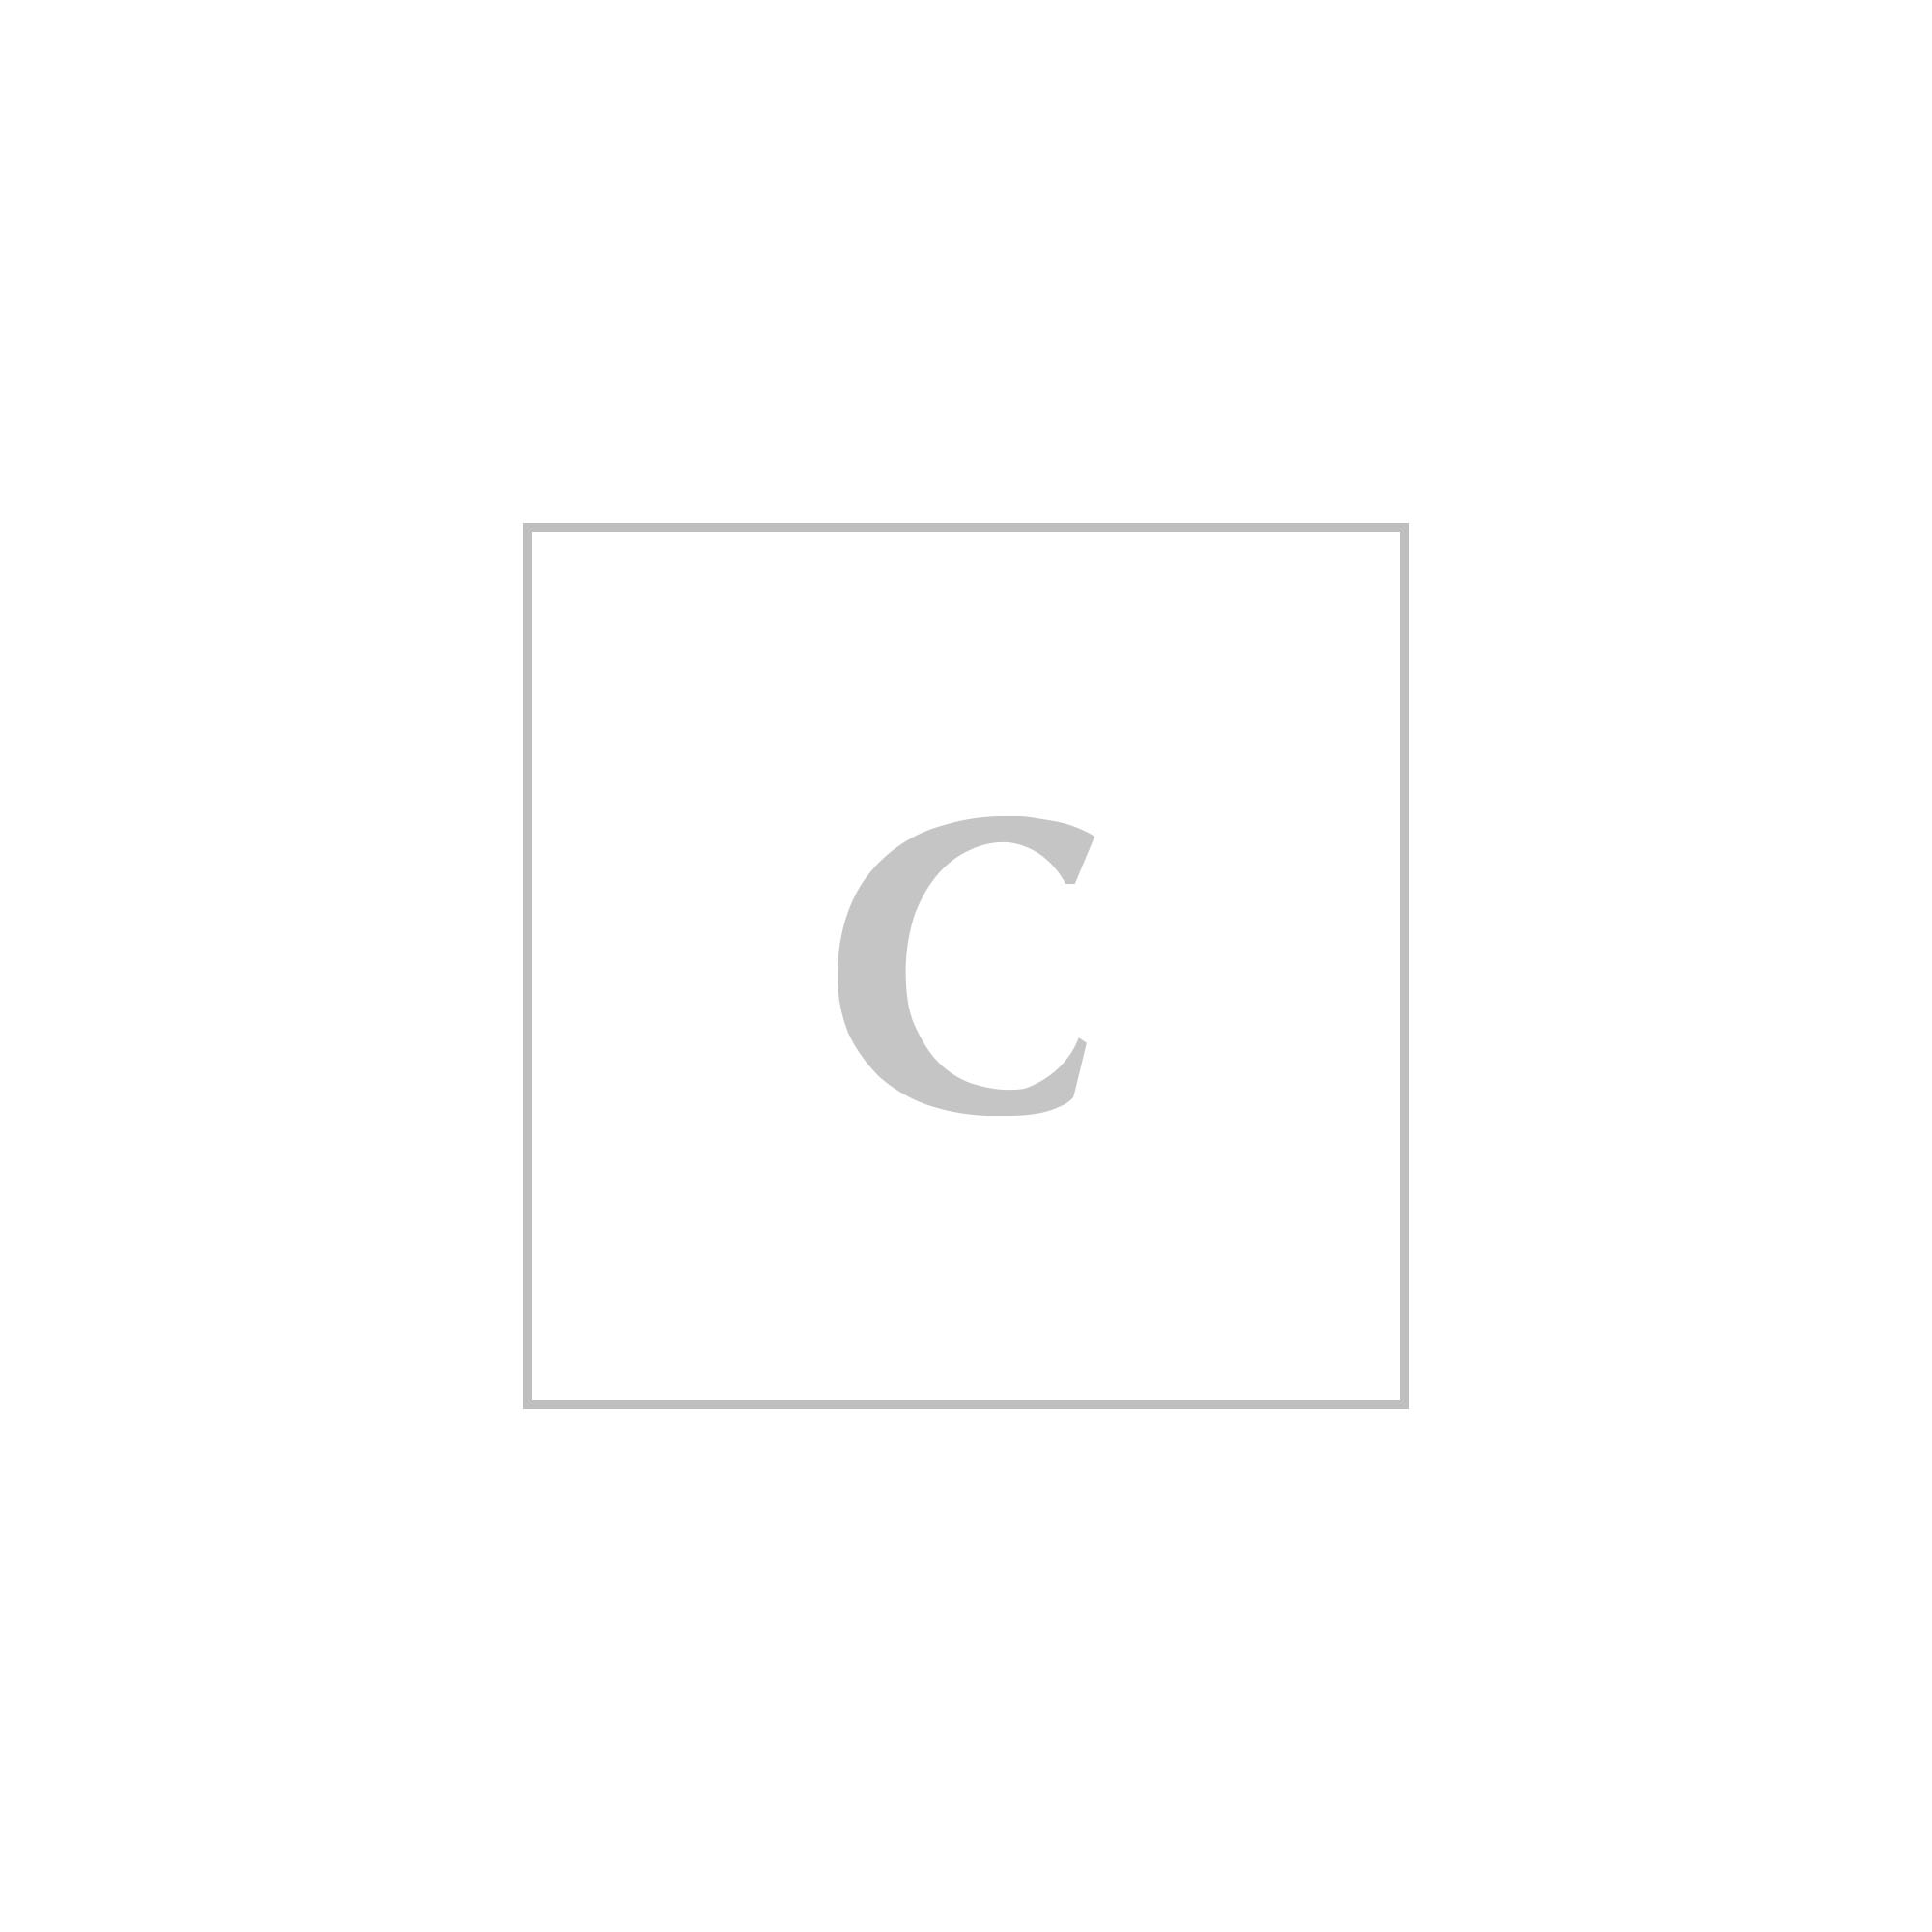 Saint laurent clutch monogram con catena